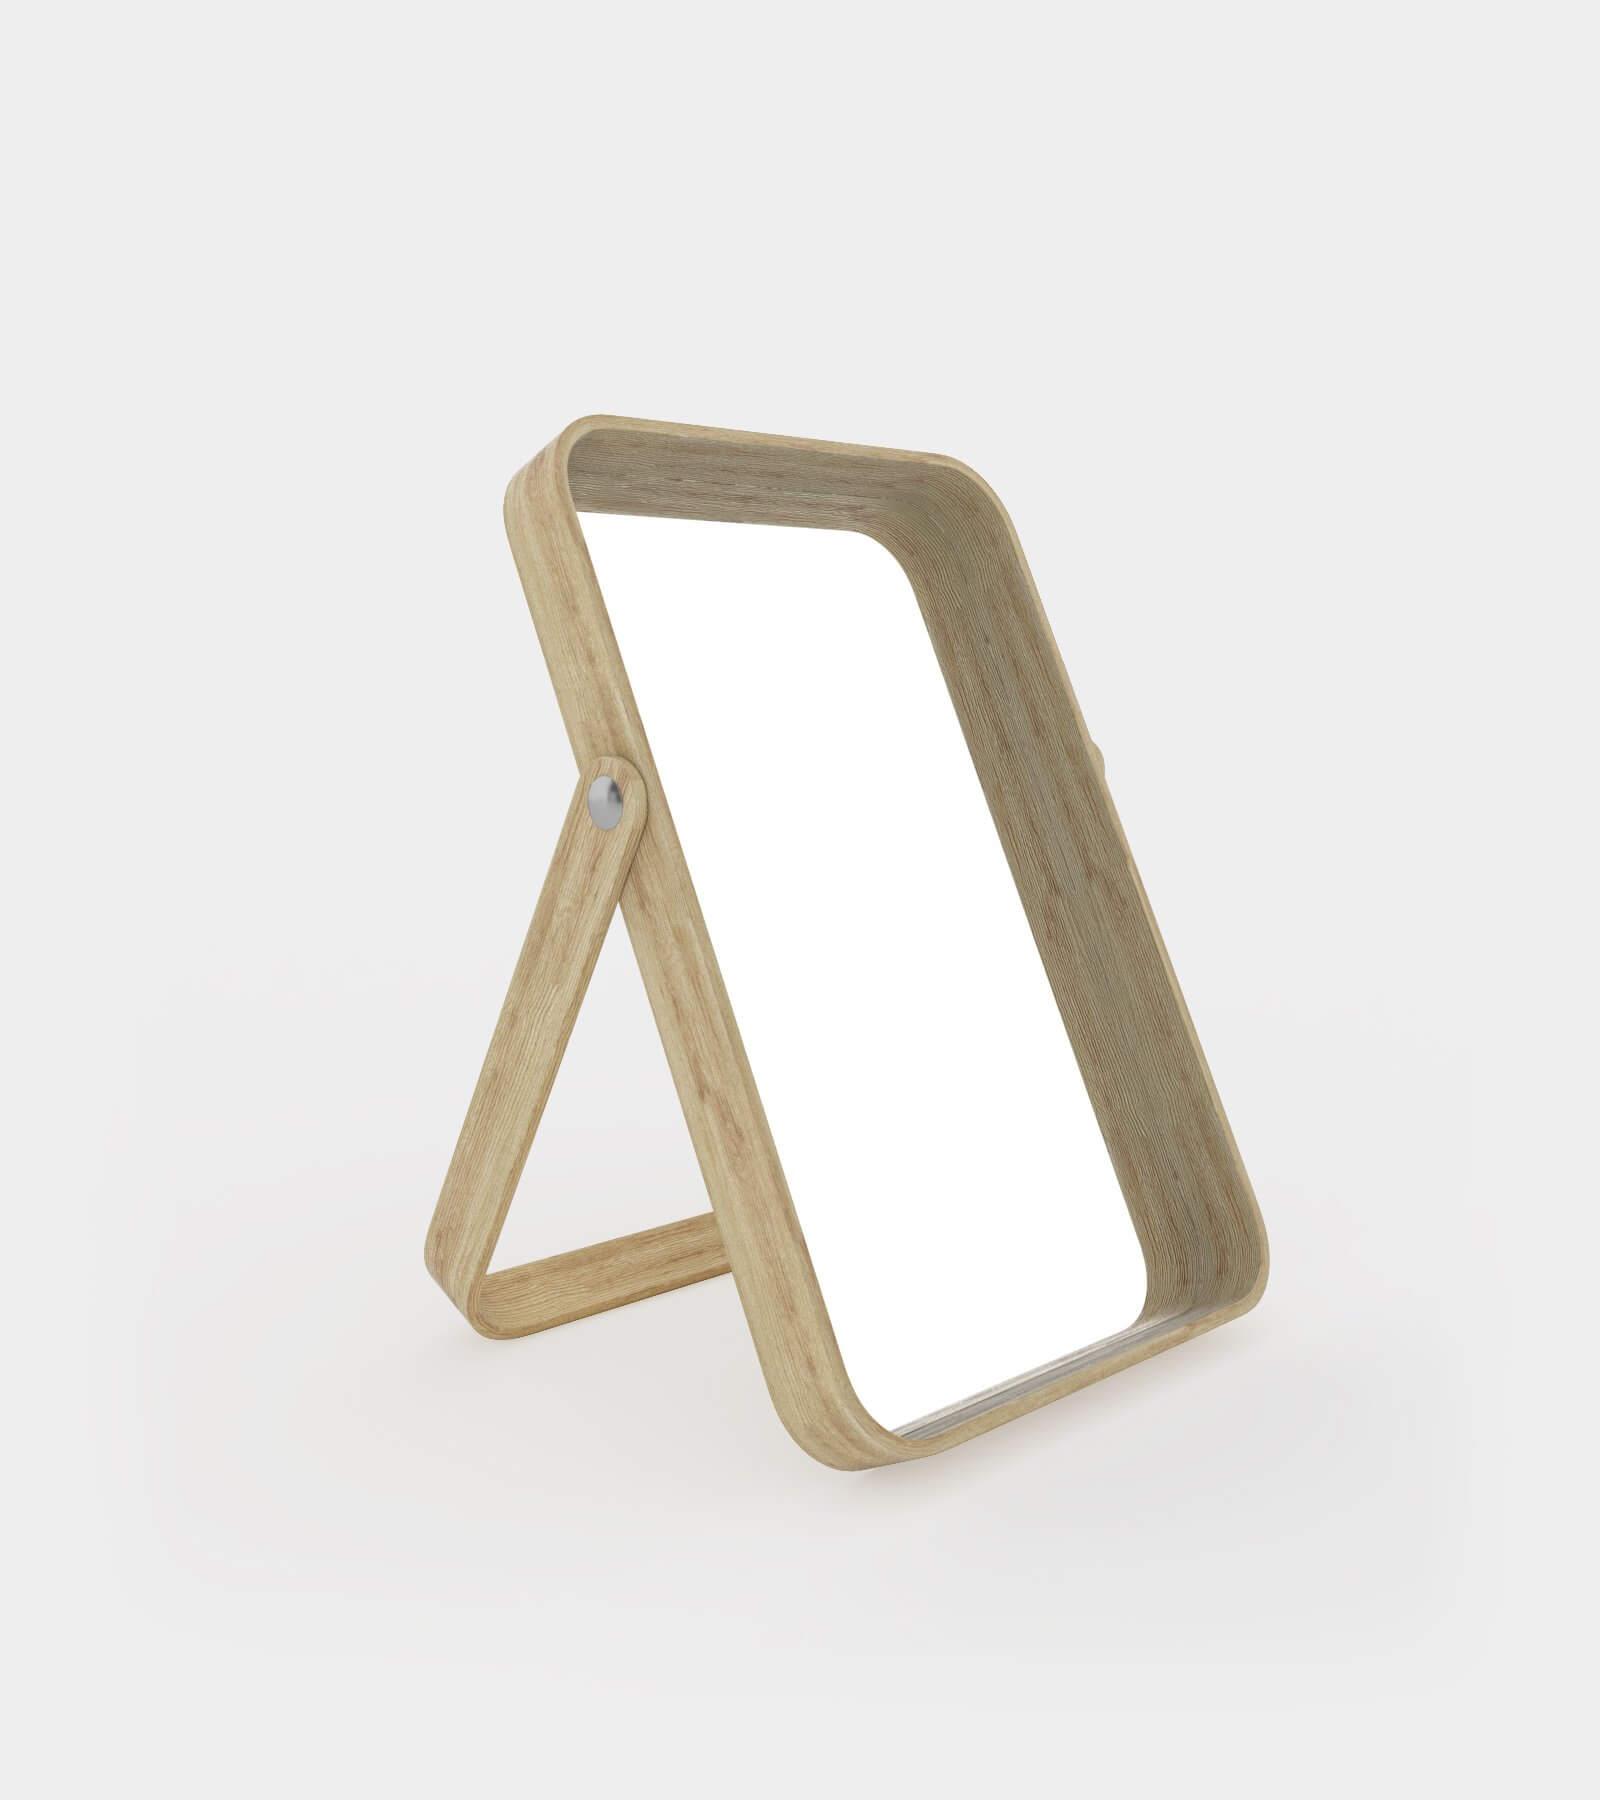 Ash table mirror-1 - 3D Model